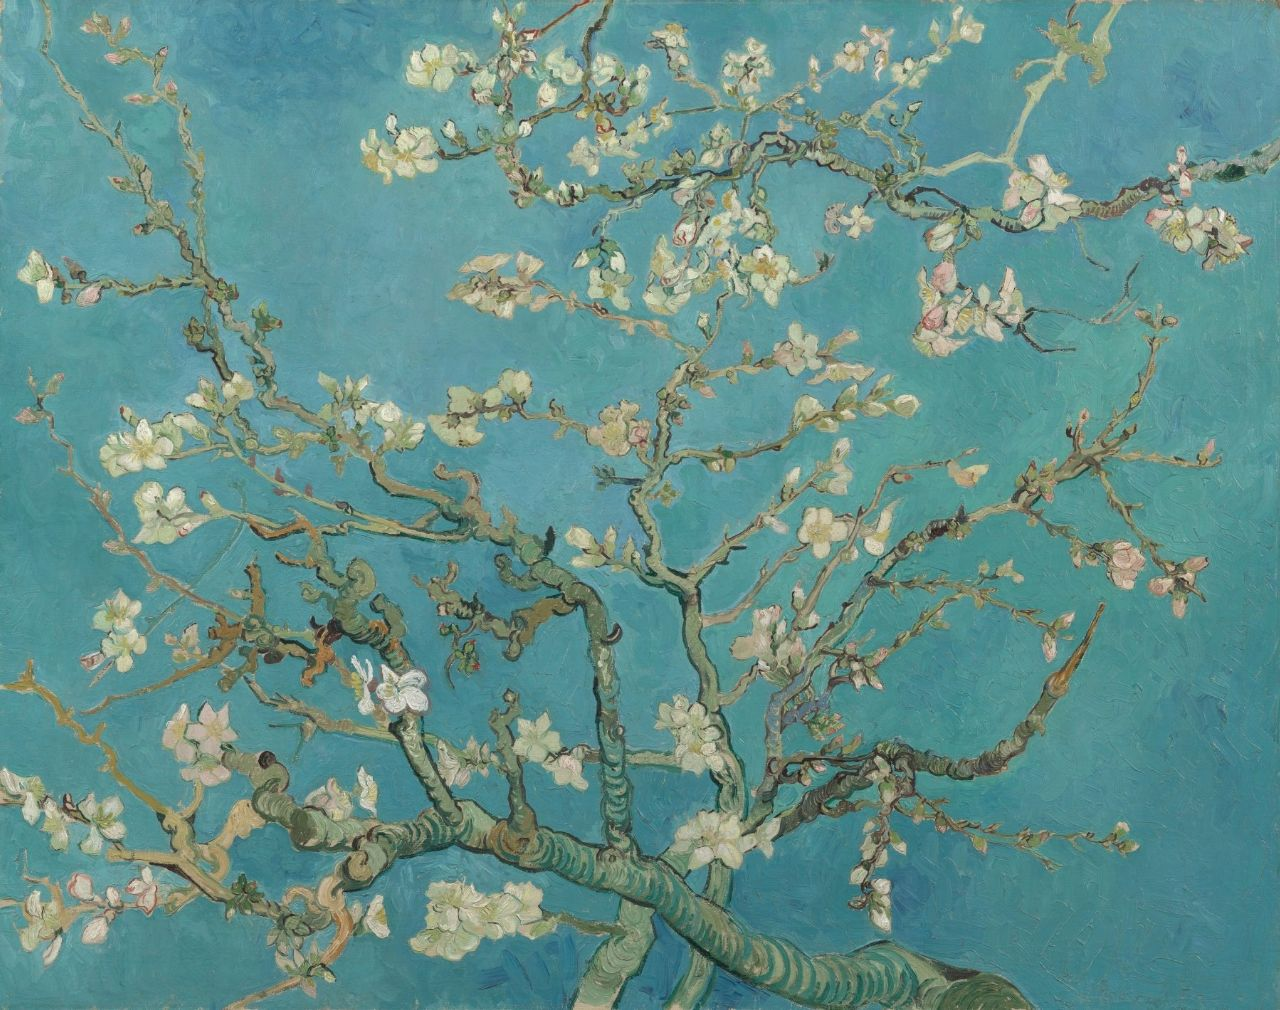 Van Gogh life and career